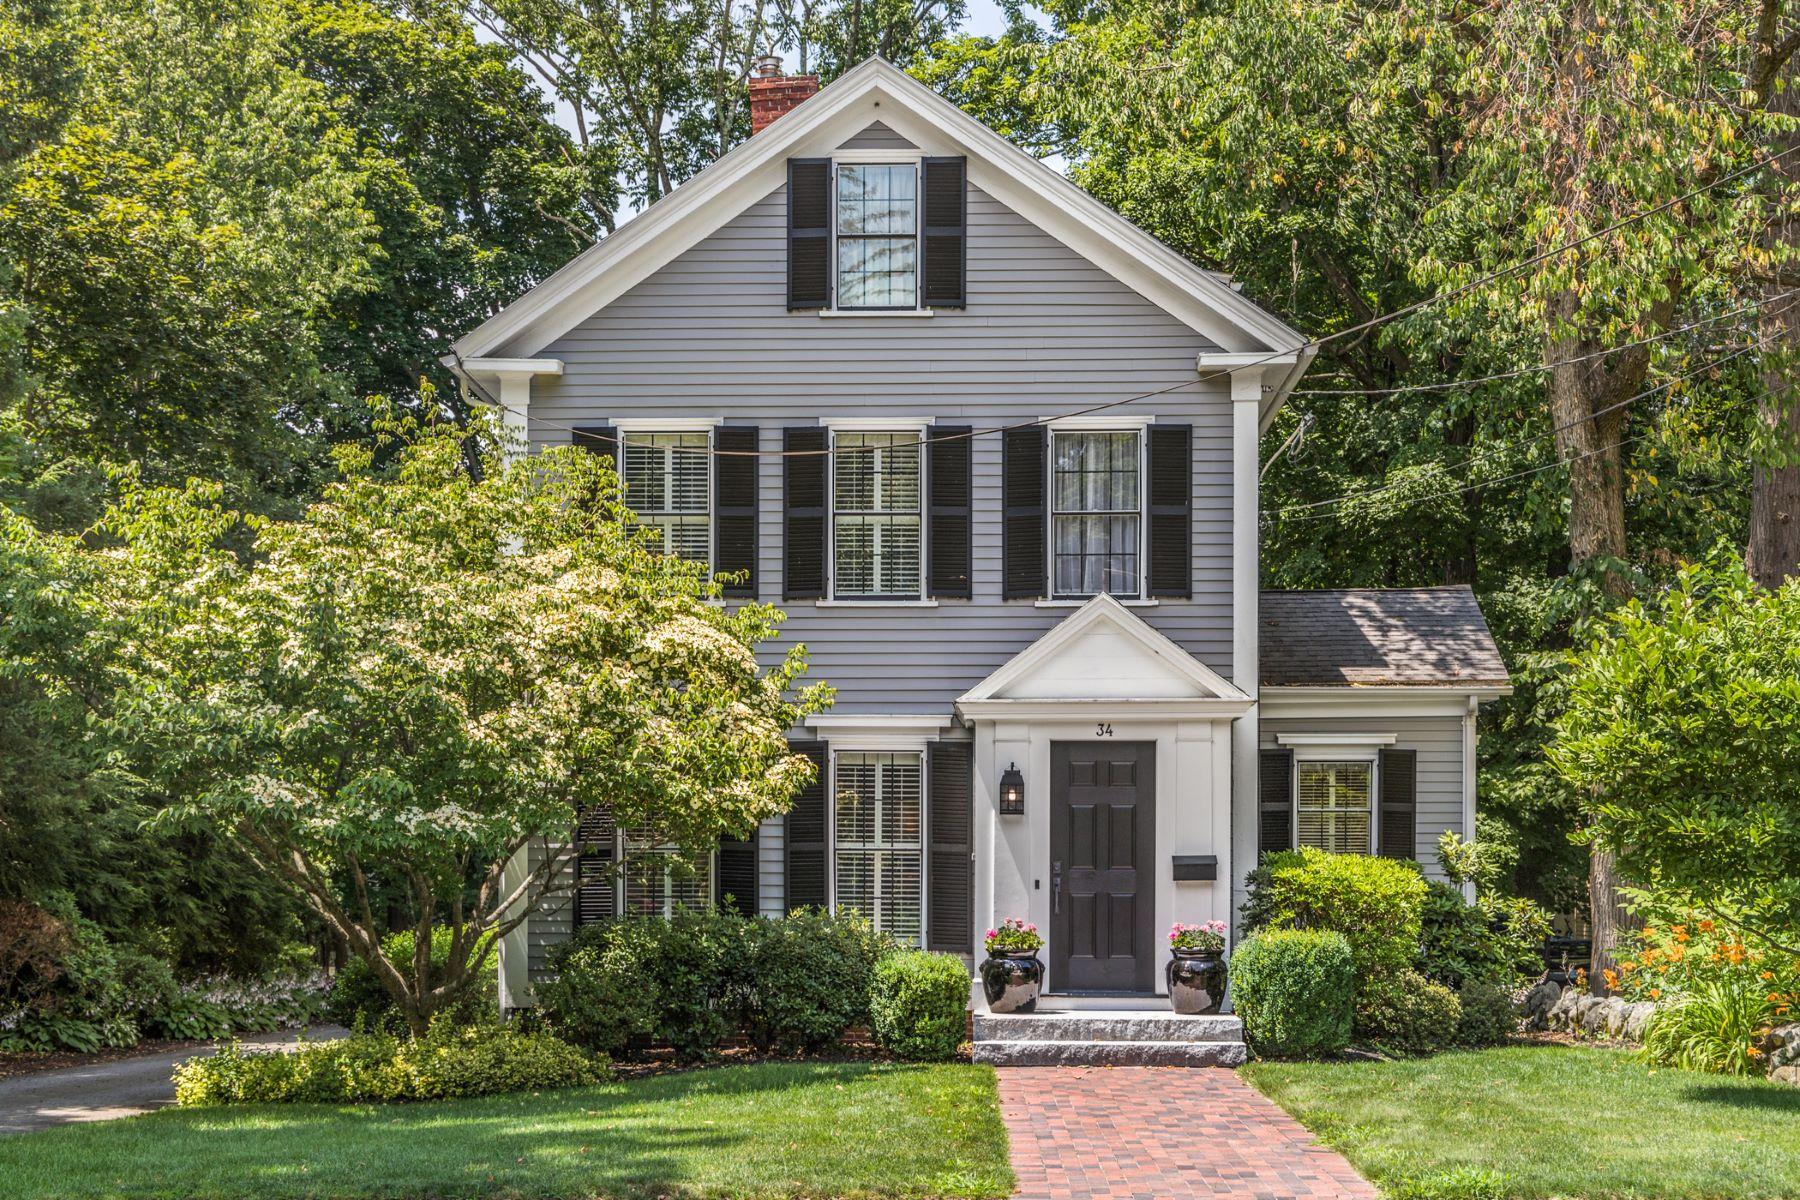 Single Family Homes for Sale at 34 Hancock Street, Lexington 34 Hancock St Lexington, Massachusetts 02420 United States